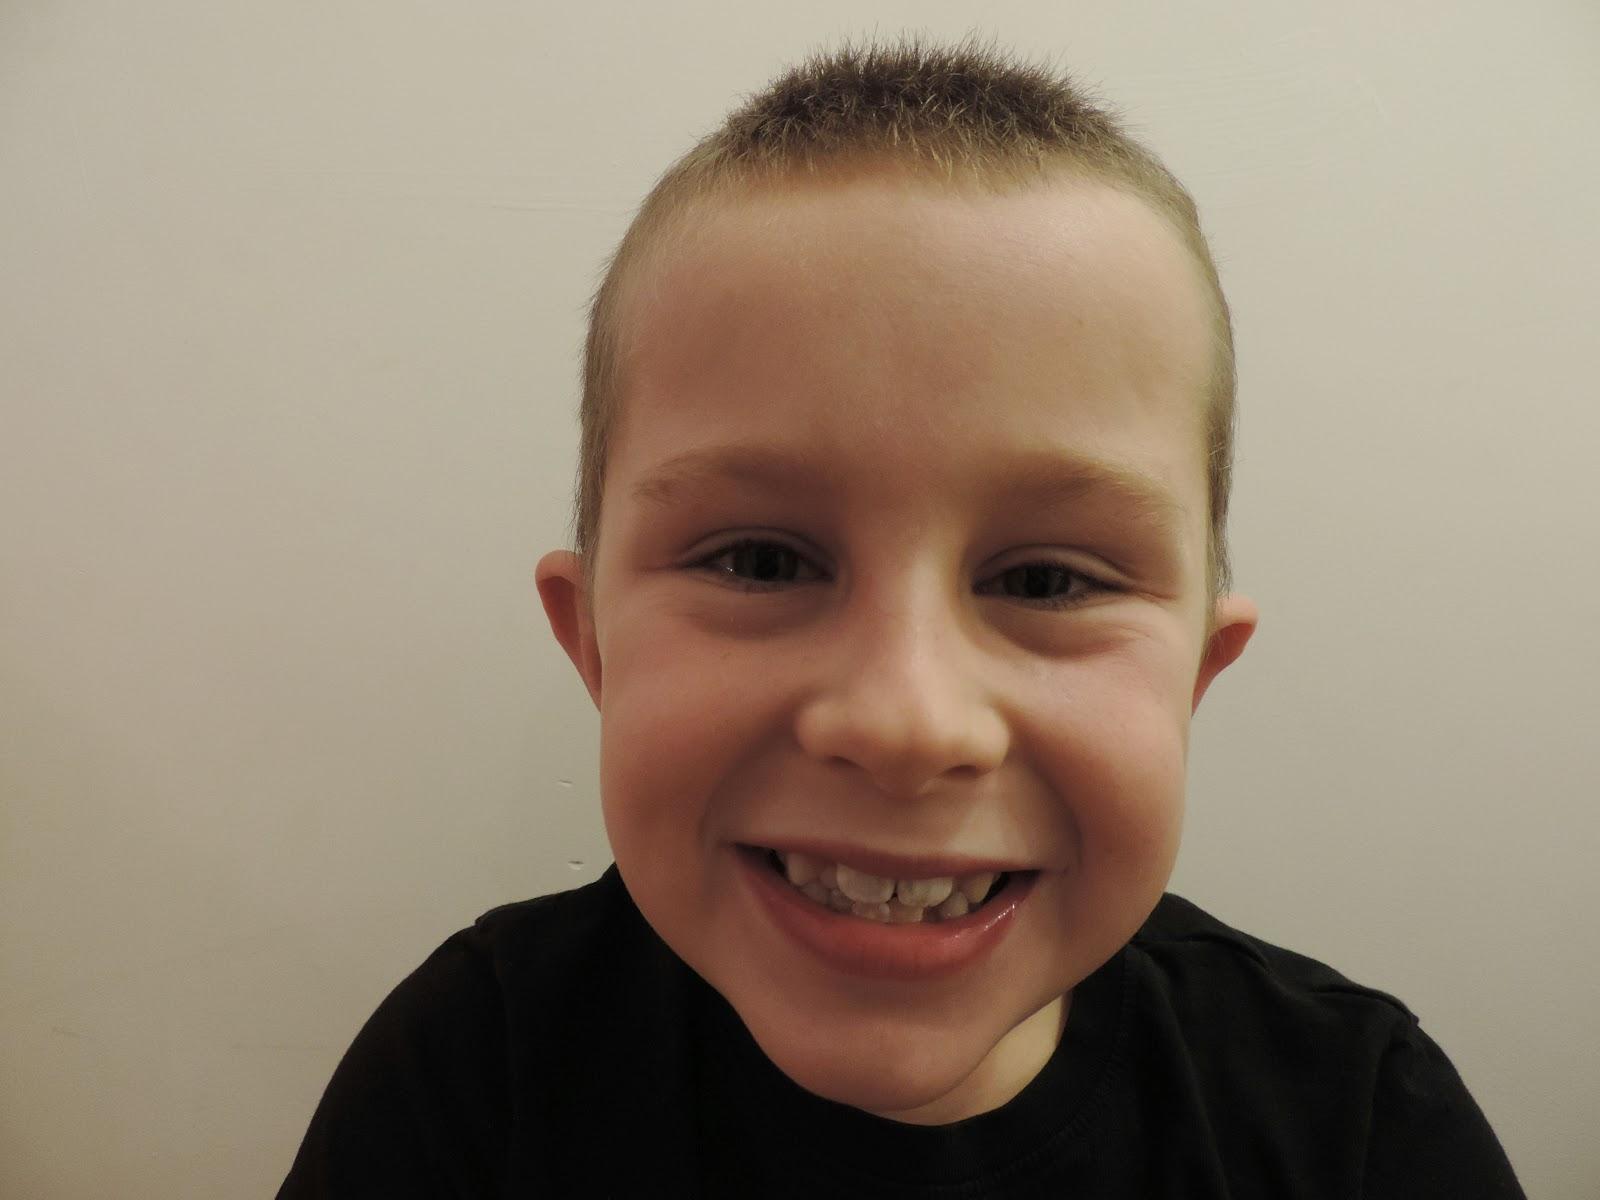 gurning boy smiling